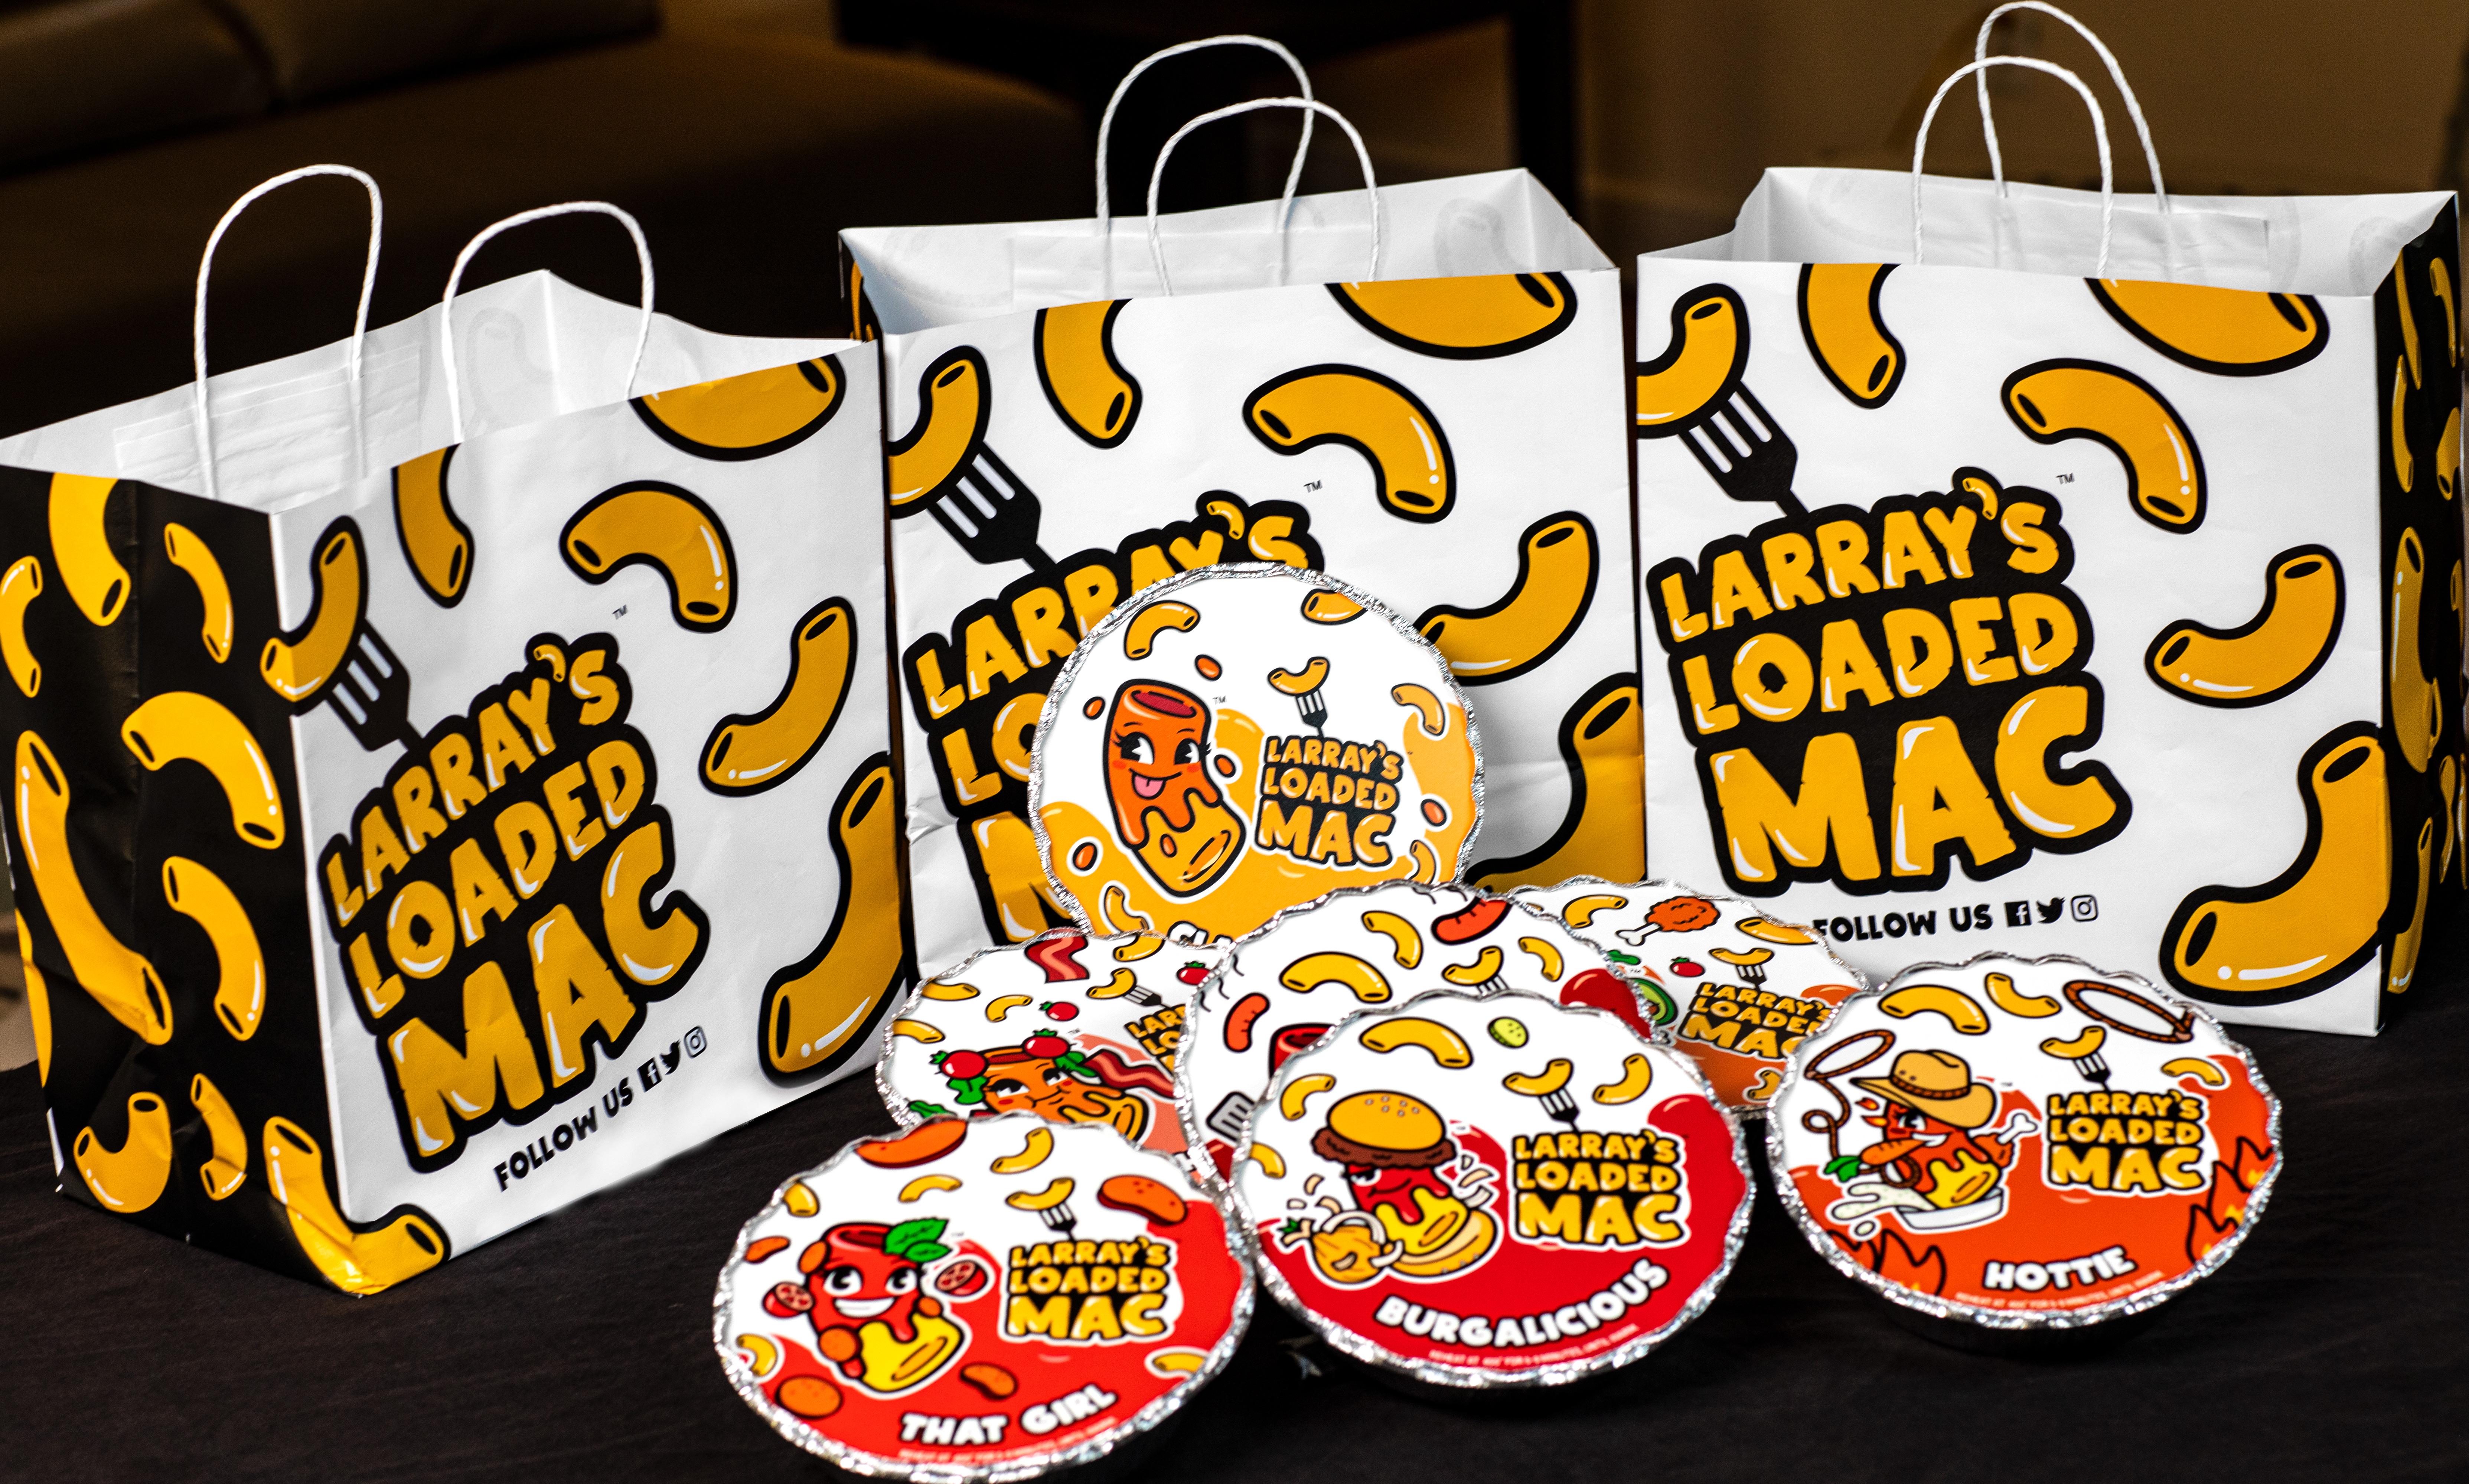 Larray's Loaded Mac food